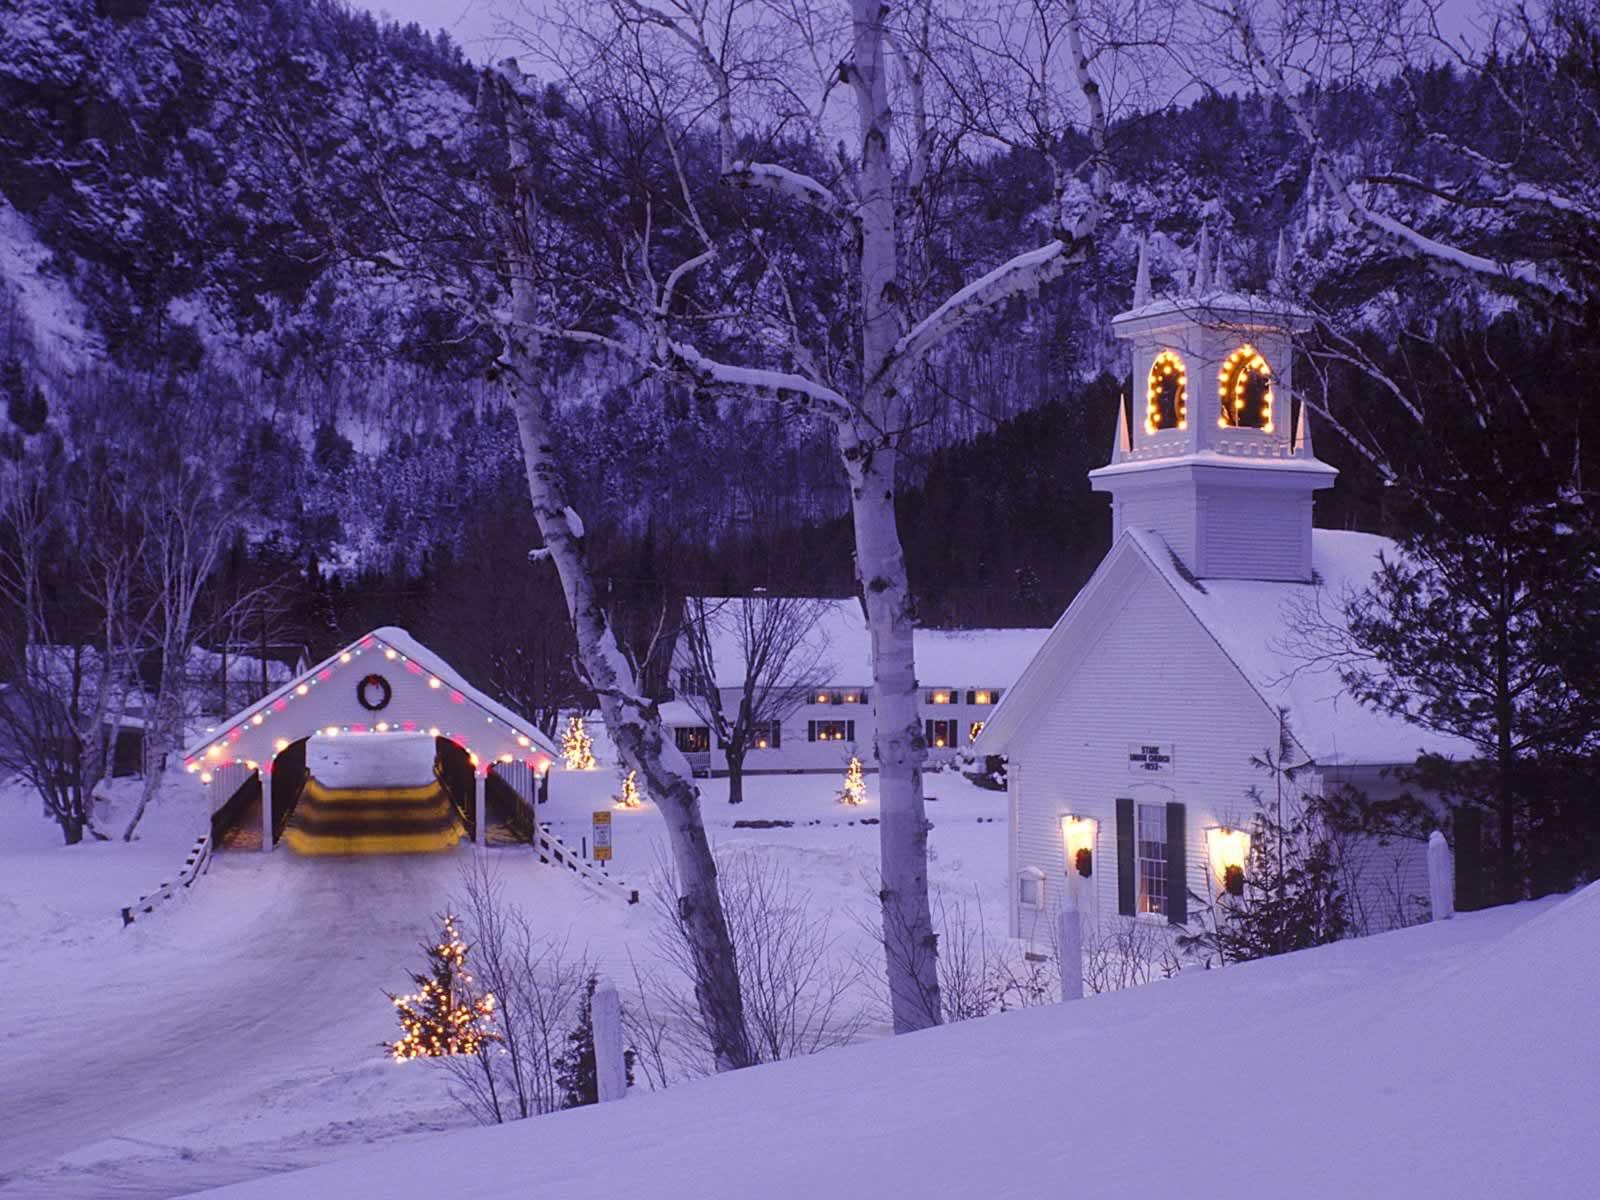 Christmas Stark New Hampshire   Christmas Landscapes Wallpaper Image 1600x1200